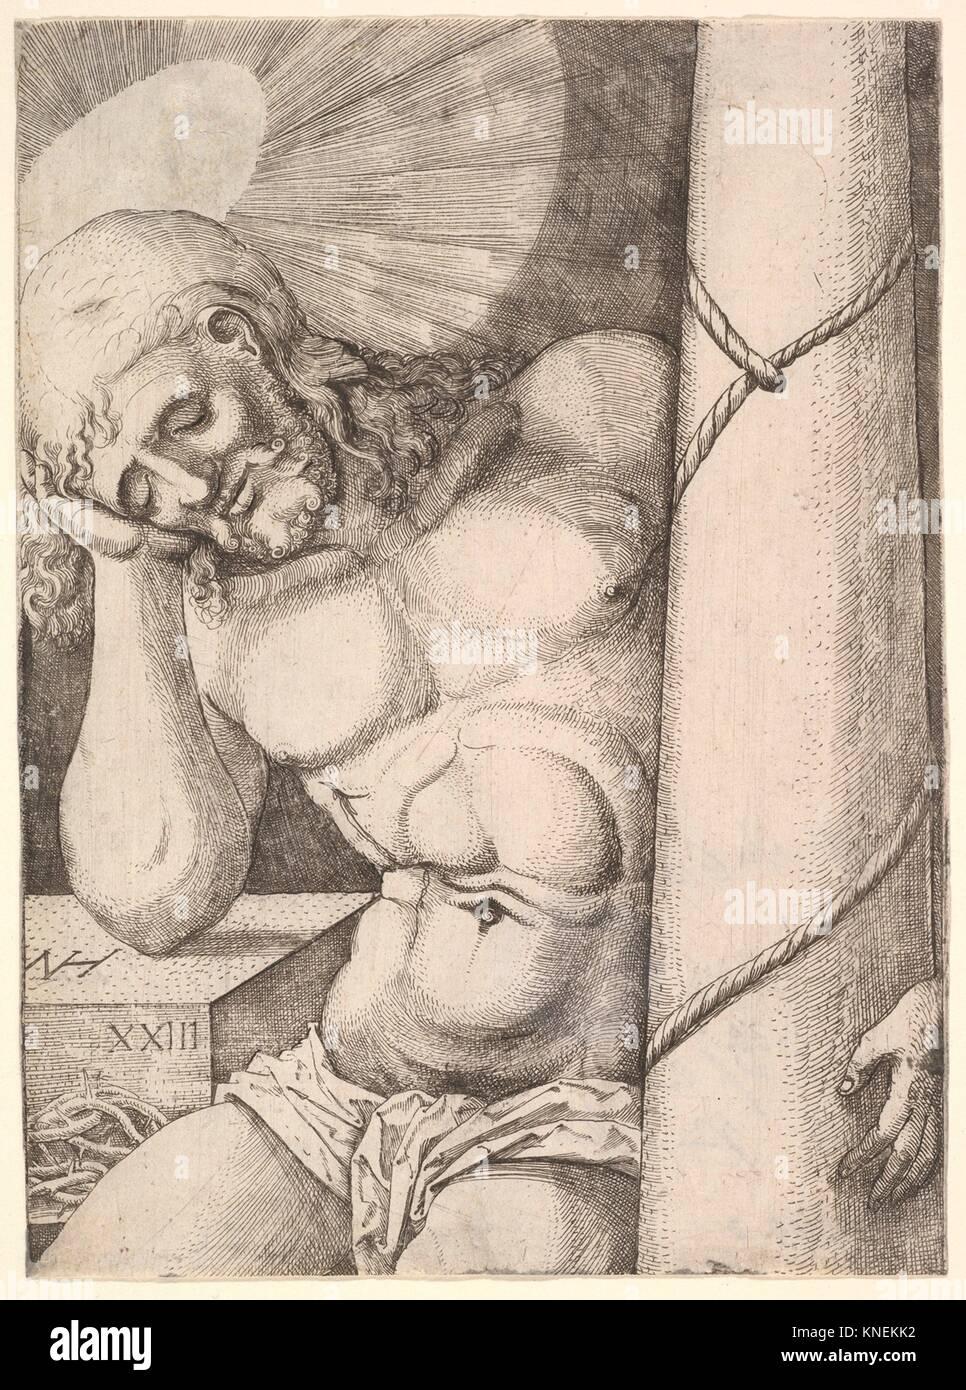 The Man of Sorrows at the Column. Artist: Nikolaus Hogenberg (Netherlandish, Munich ca. 1500-1539 Mechelen); Date: - Stock Image